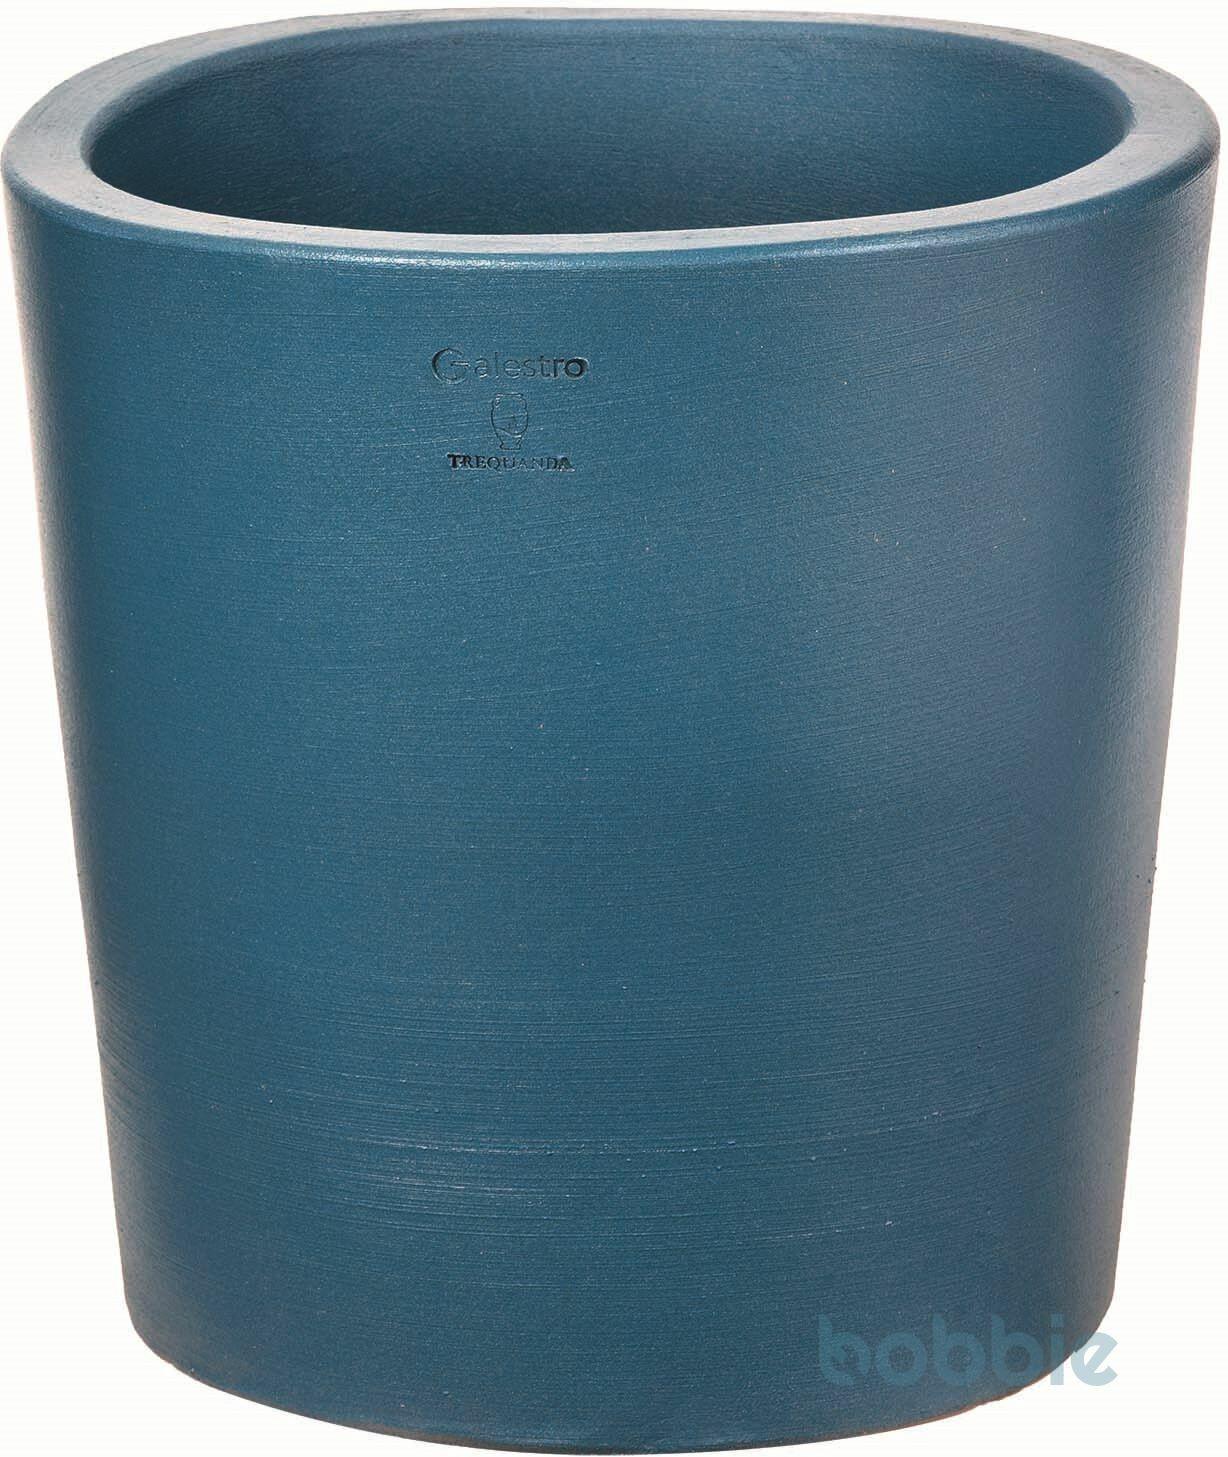 Blumentopf runde Vase modern - VASO ROTONDO MODERNE CM.40 - PREMIUM LIFE - SKY